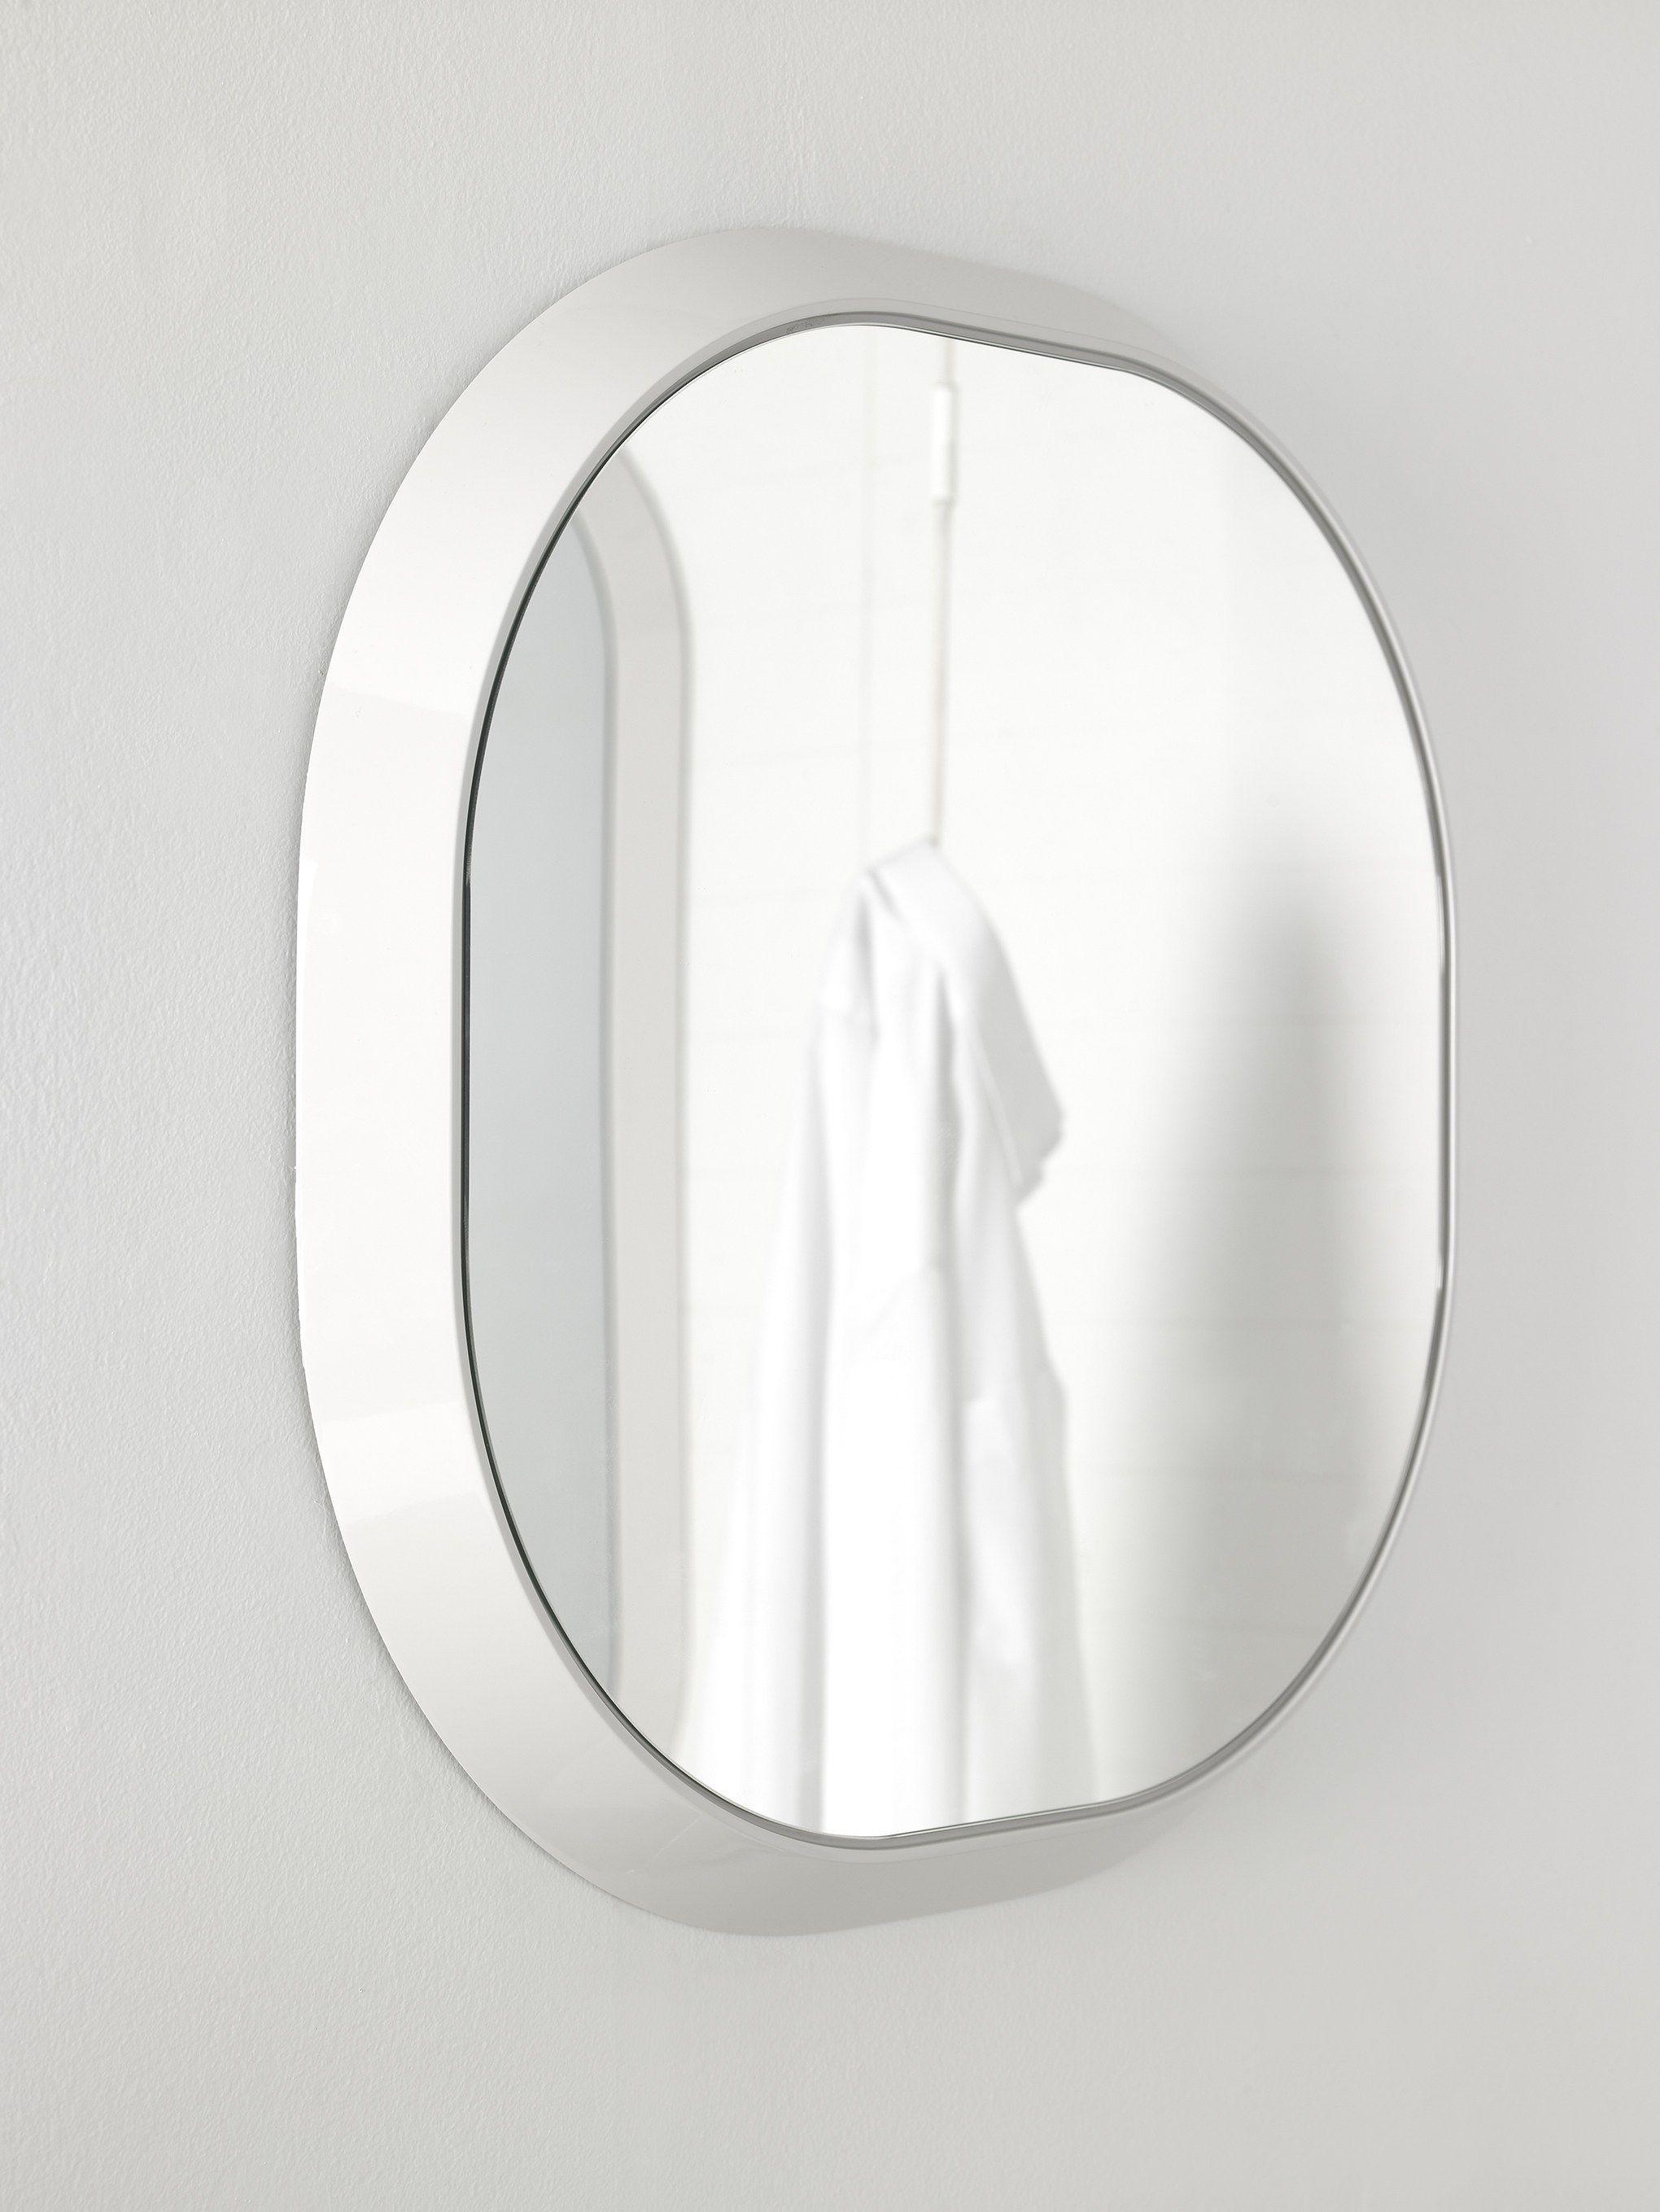 Fluent specchio rotondo by inbani design arik levy - Specchio bagno rotondo ...